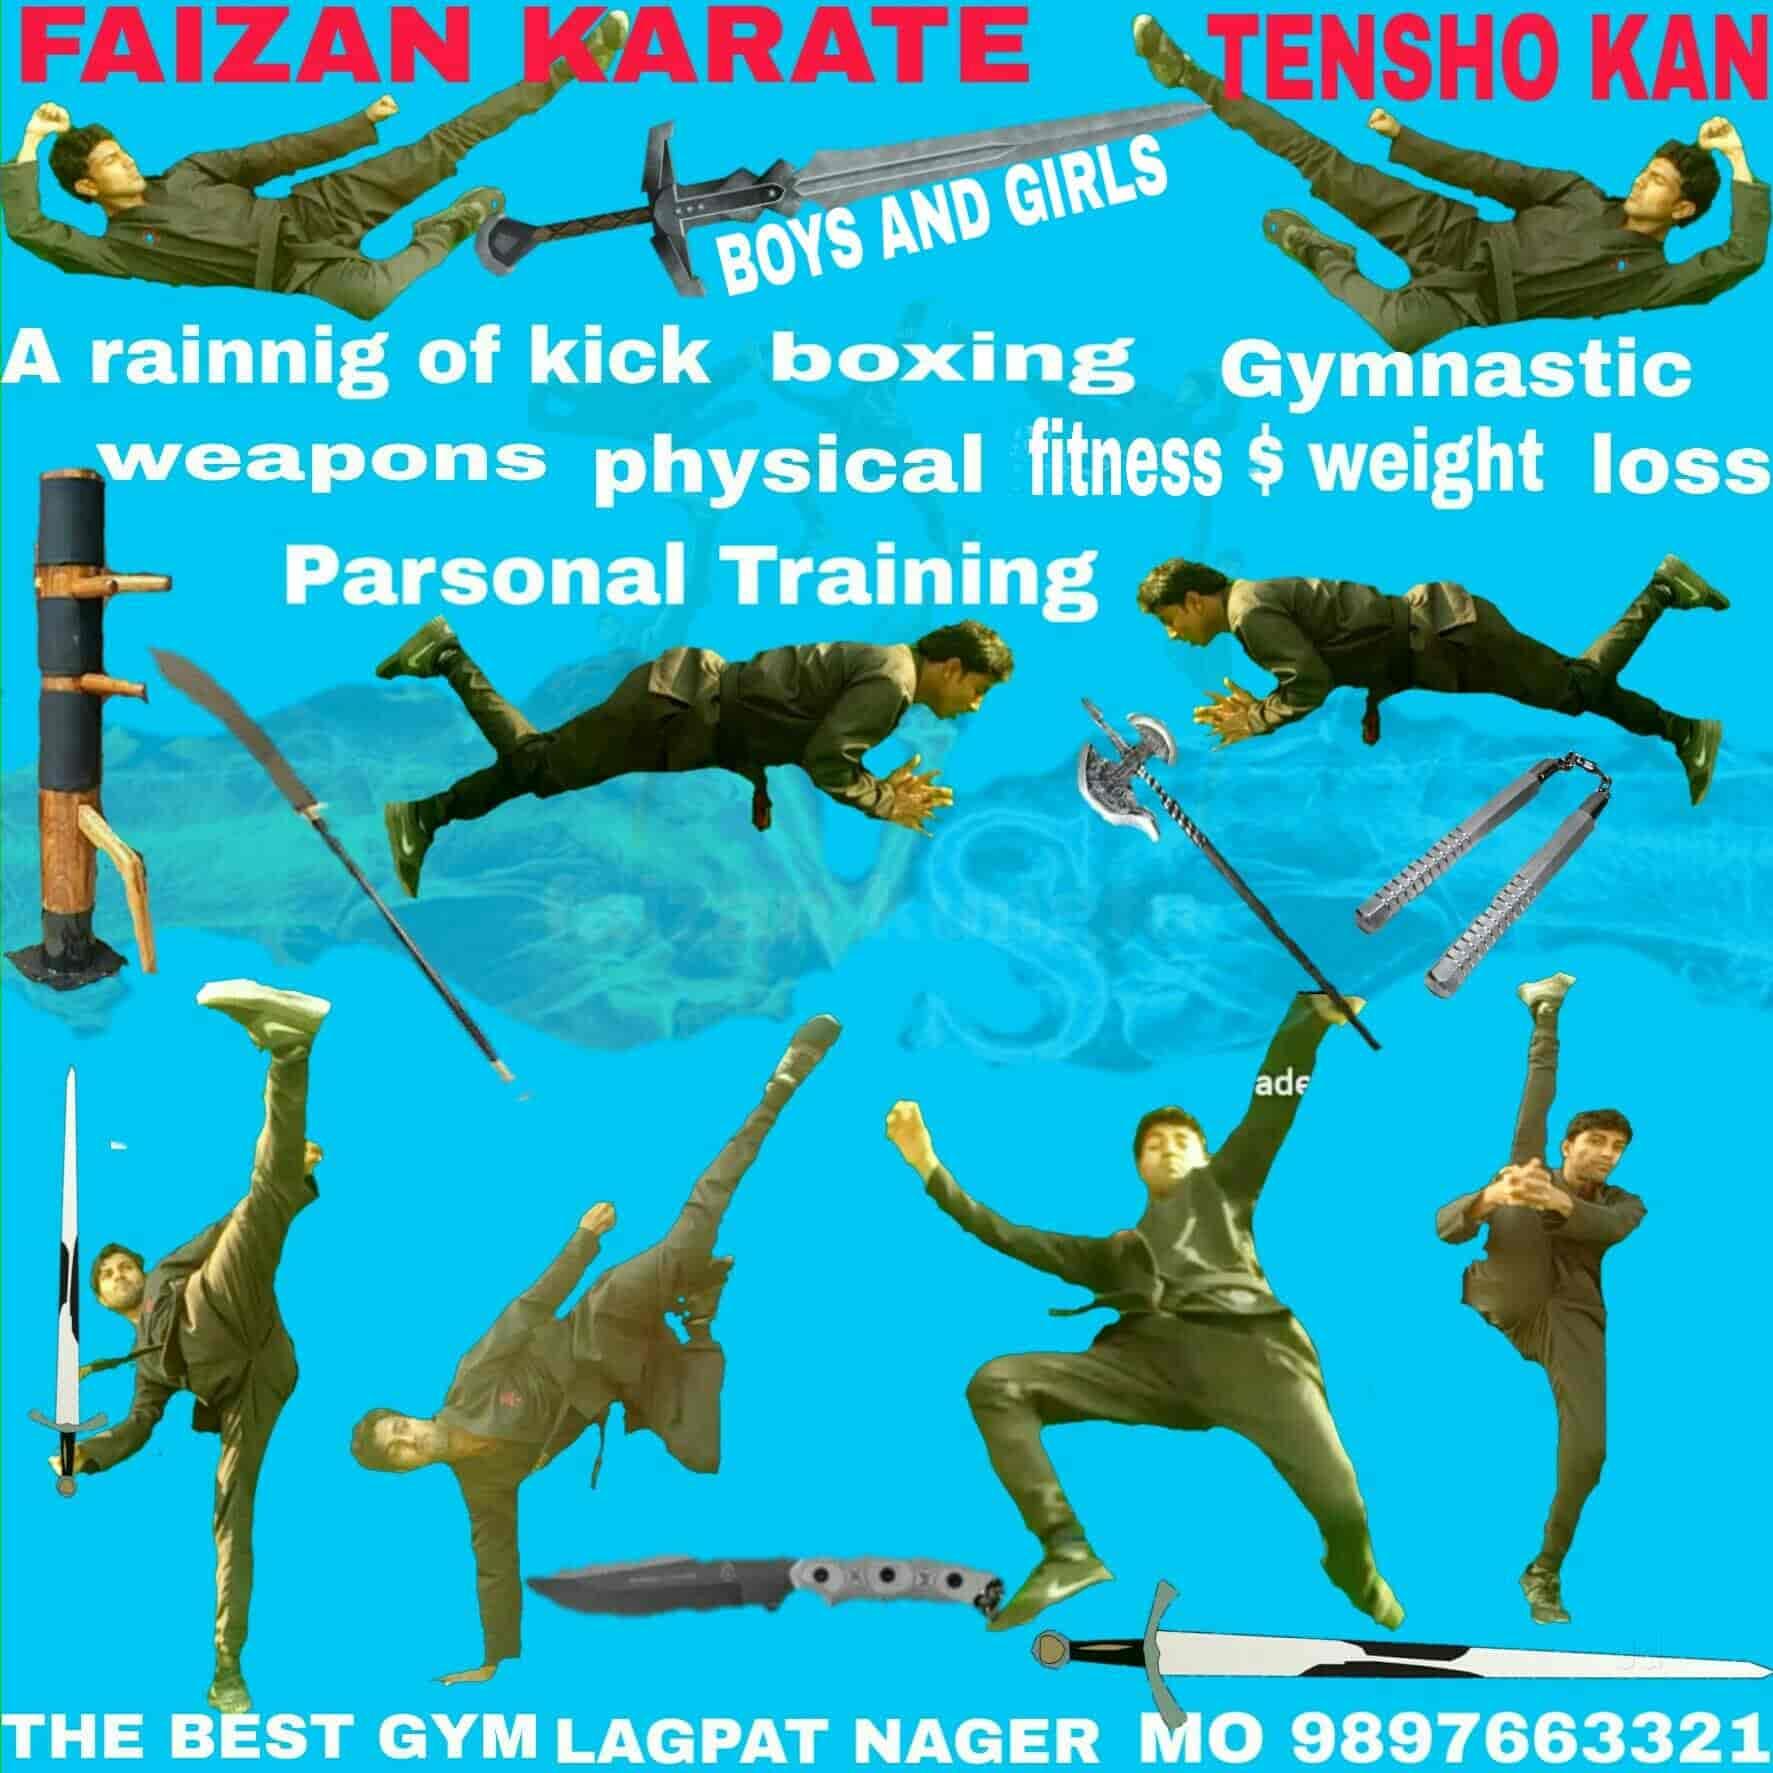 Faizan Martial Art Class, Budh Bazar - Martial Art Training